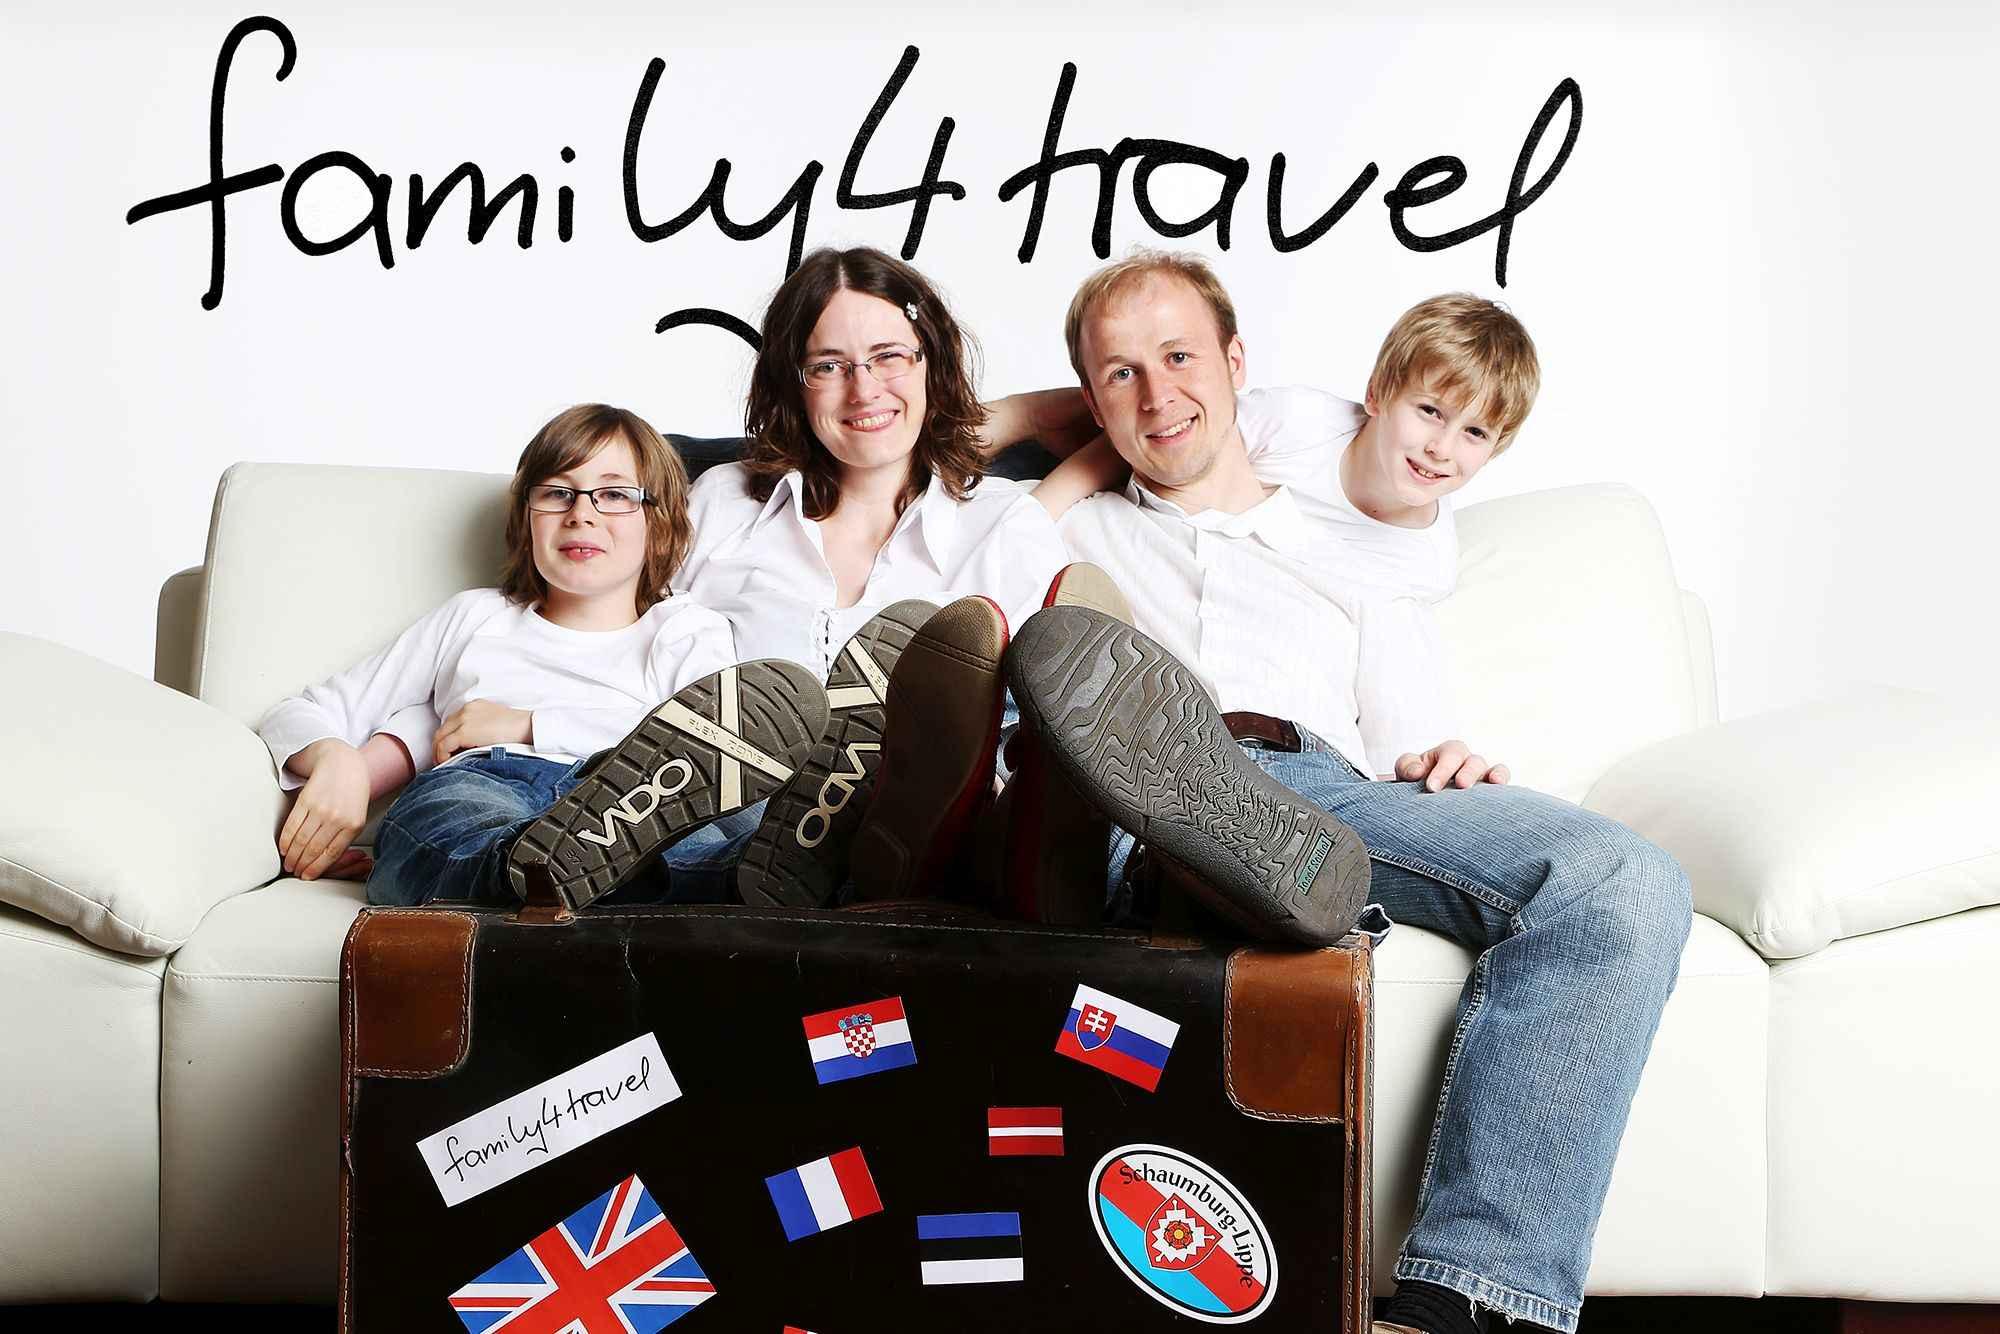 family4travel-familienfoto-gross